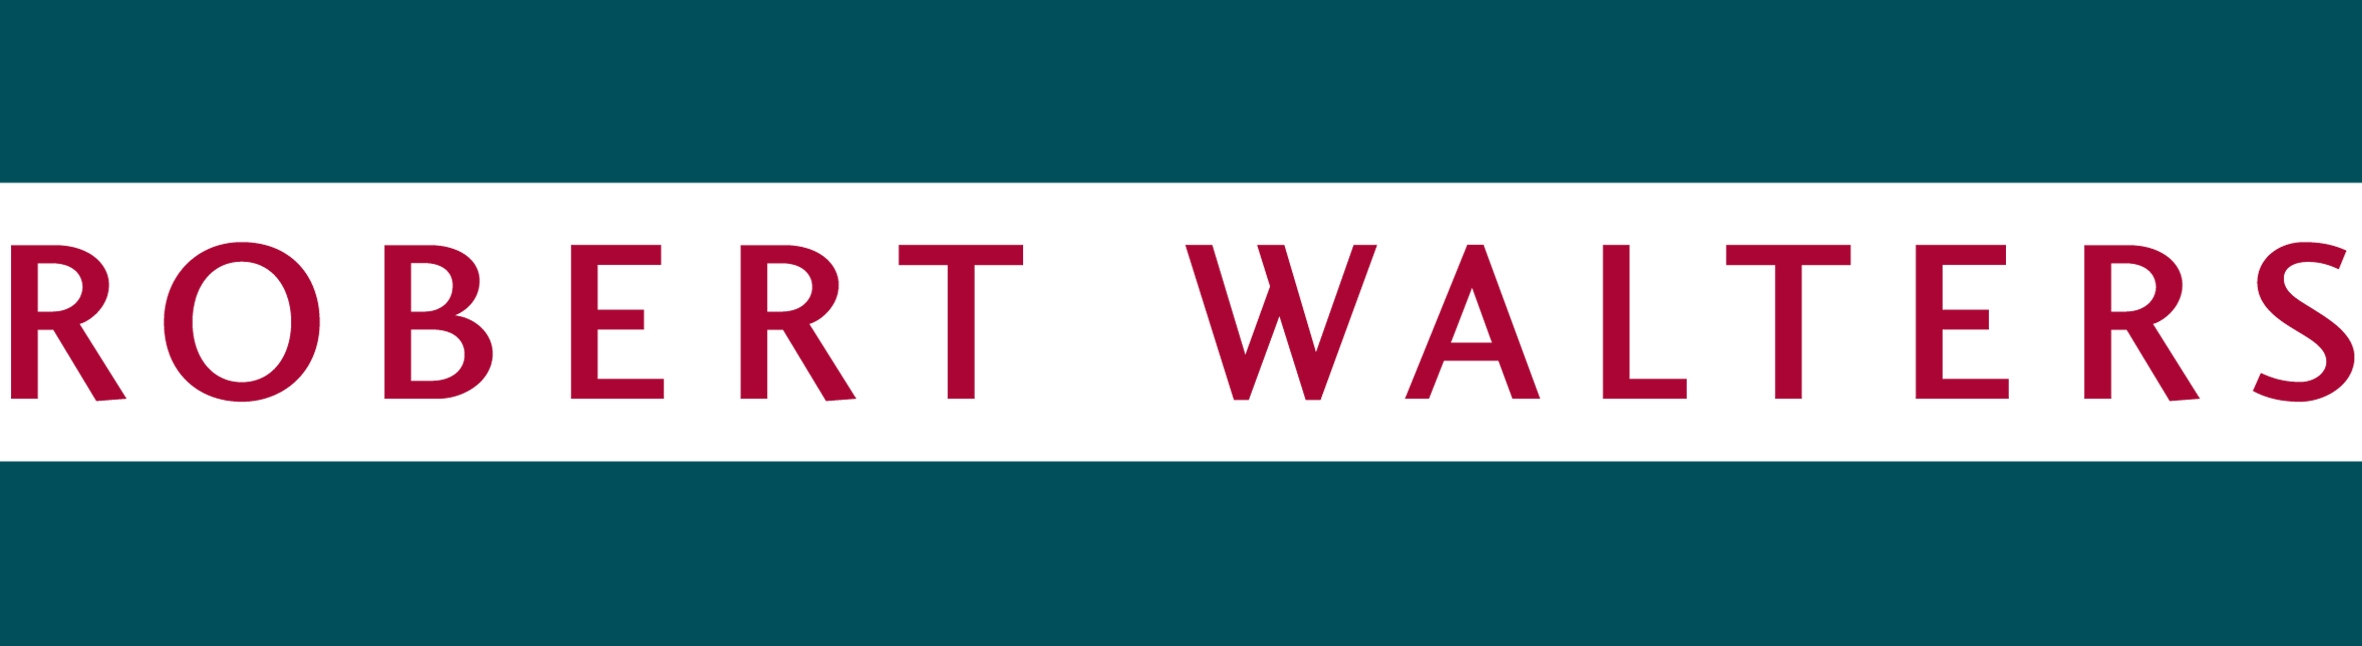 the Robert Walters logo.